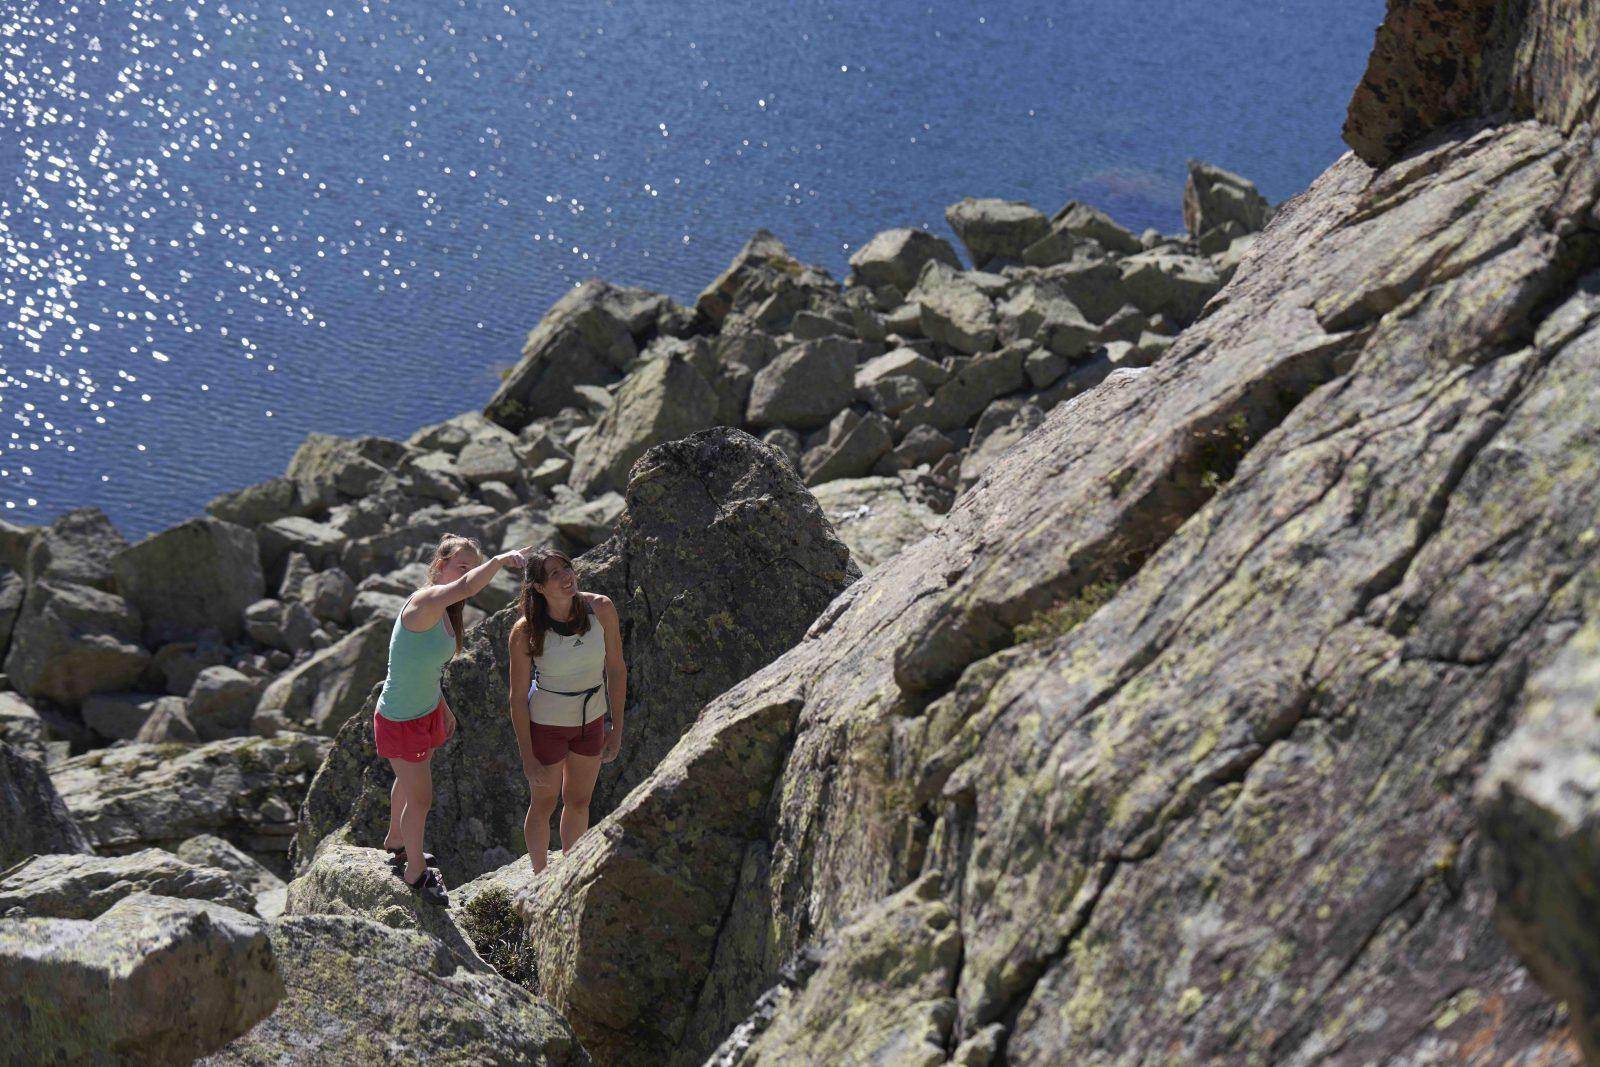 Klettern Silvapark Paznaun Ischgl @ Michael Meisl I Climbers Paradise